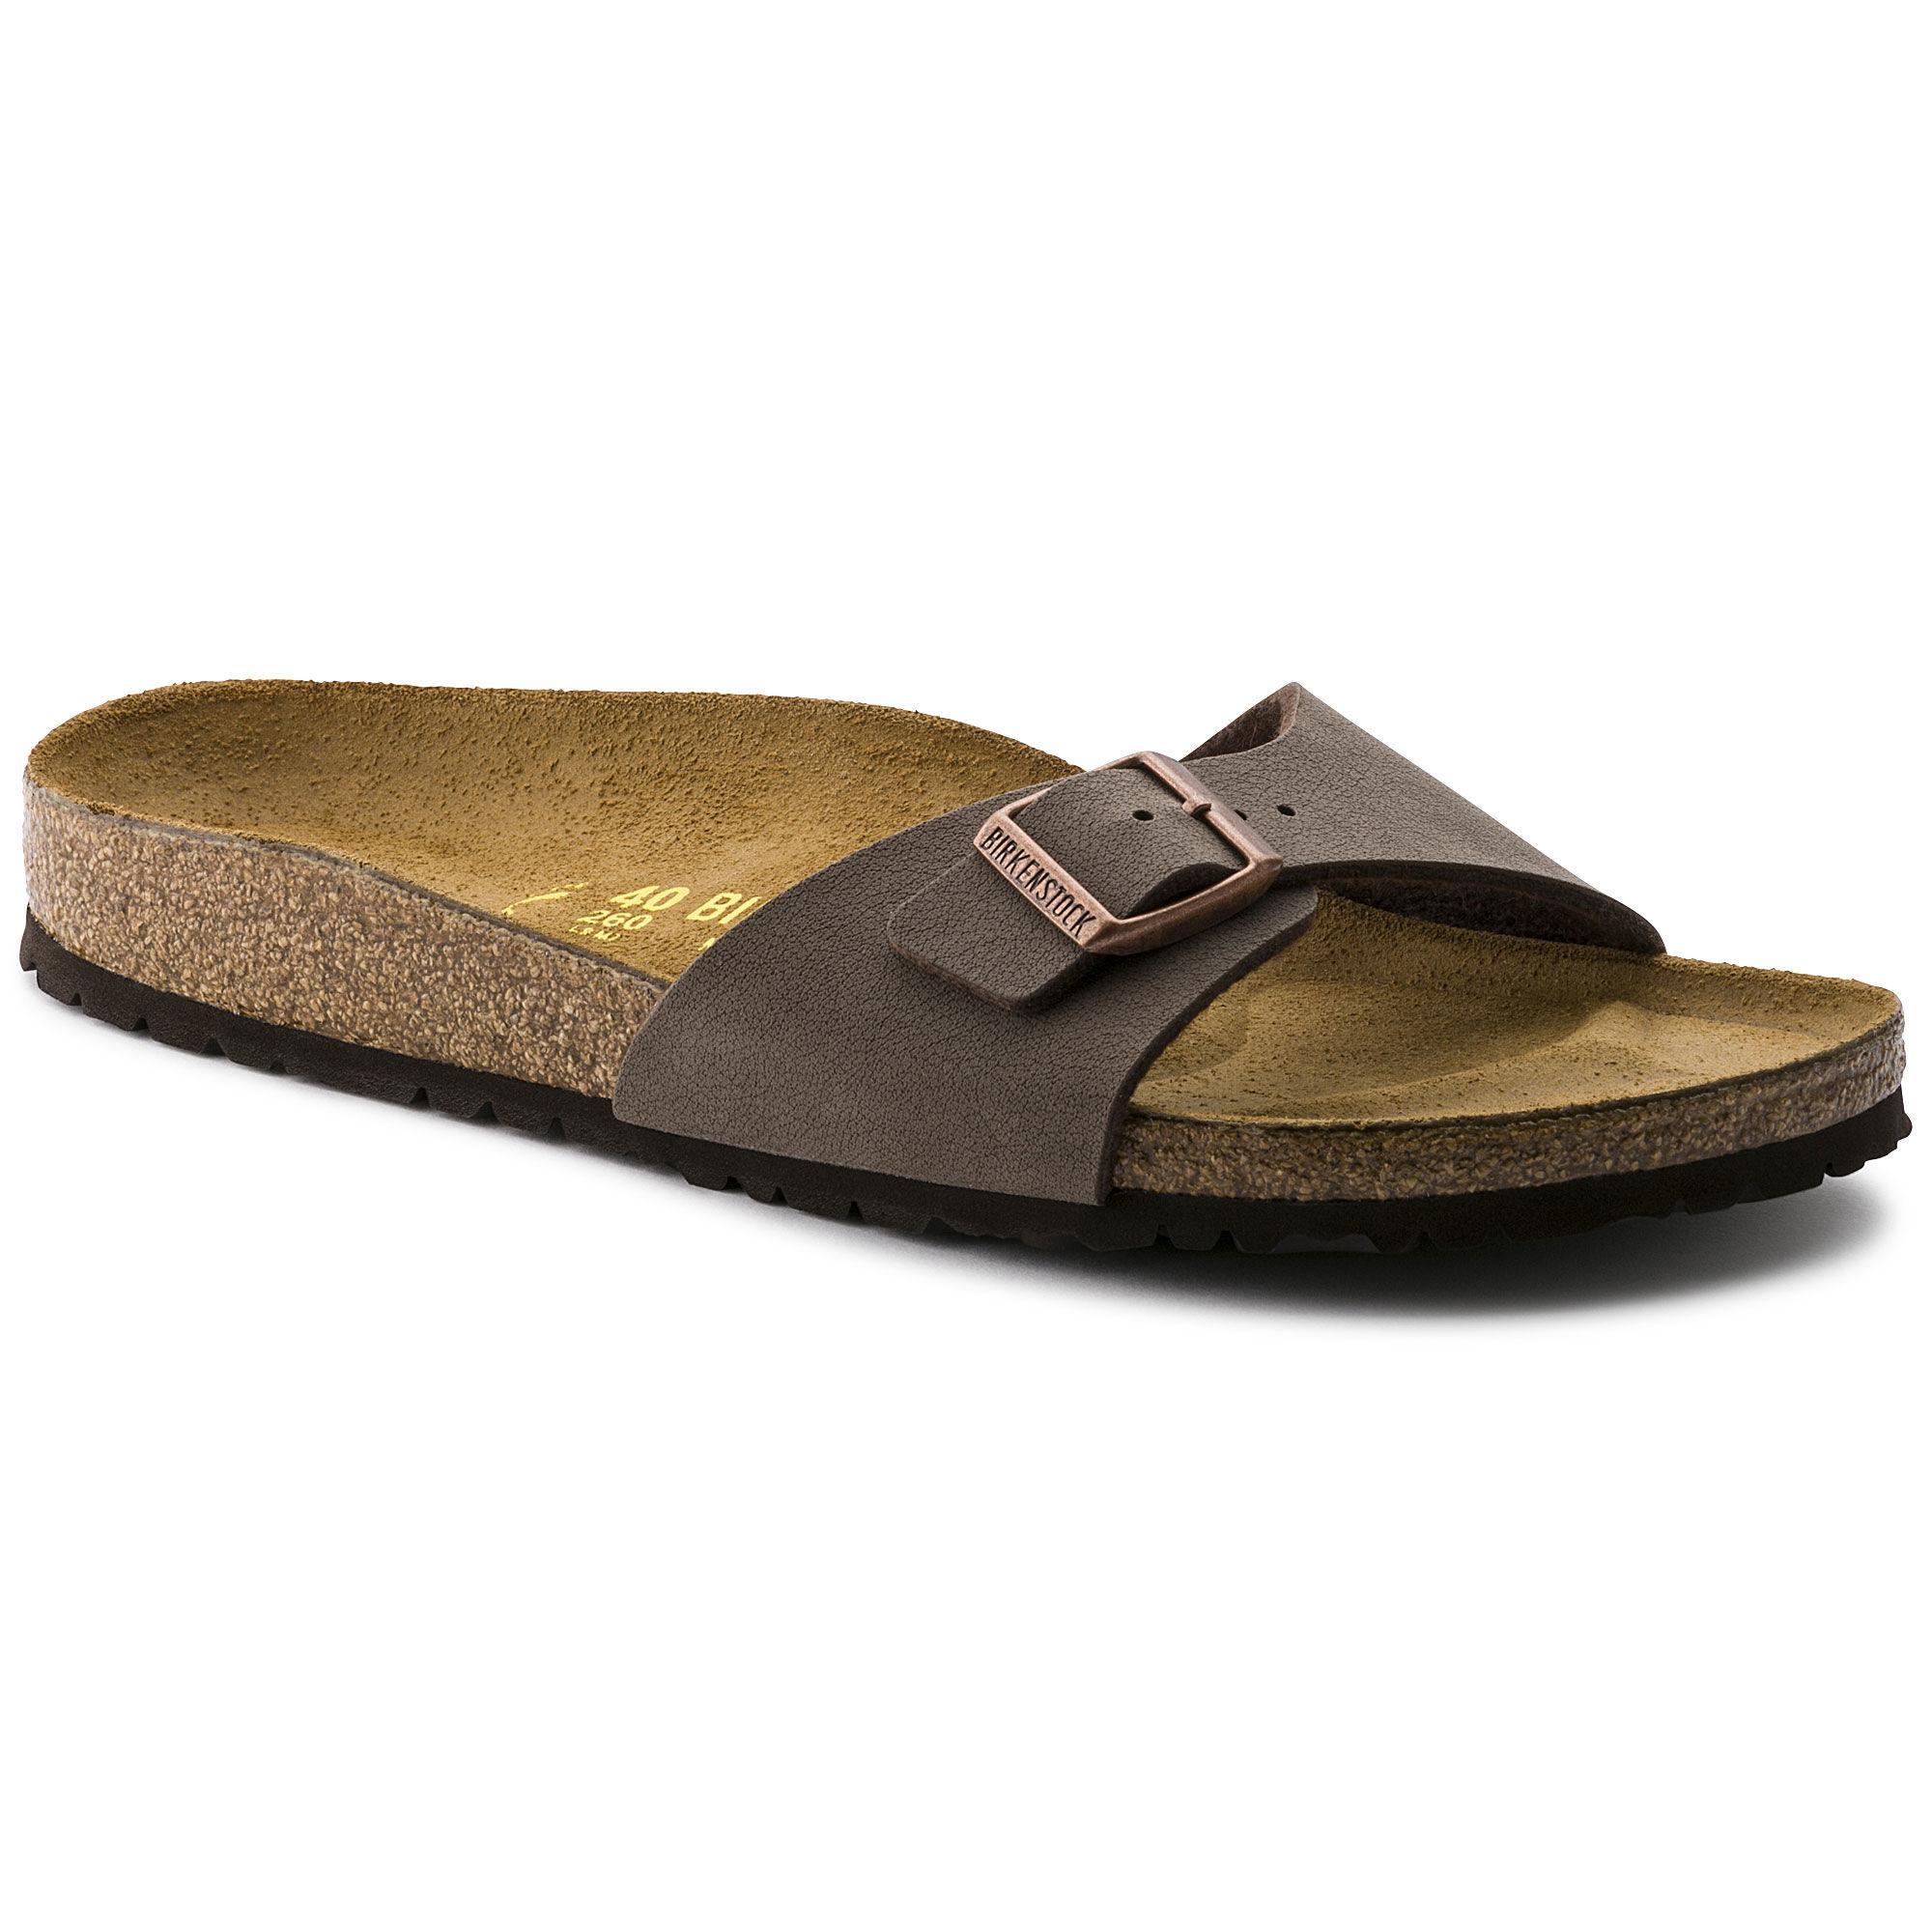 eaf77b54969d Birkenstocks Men Sandals Women Madrid Birko-Flor Nubuck Mocha